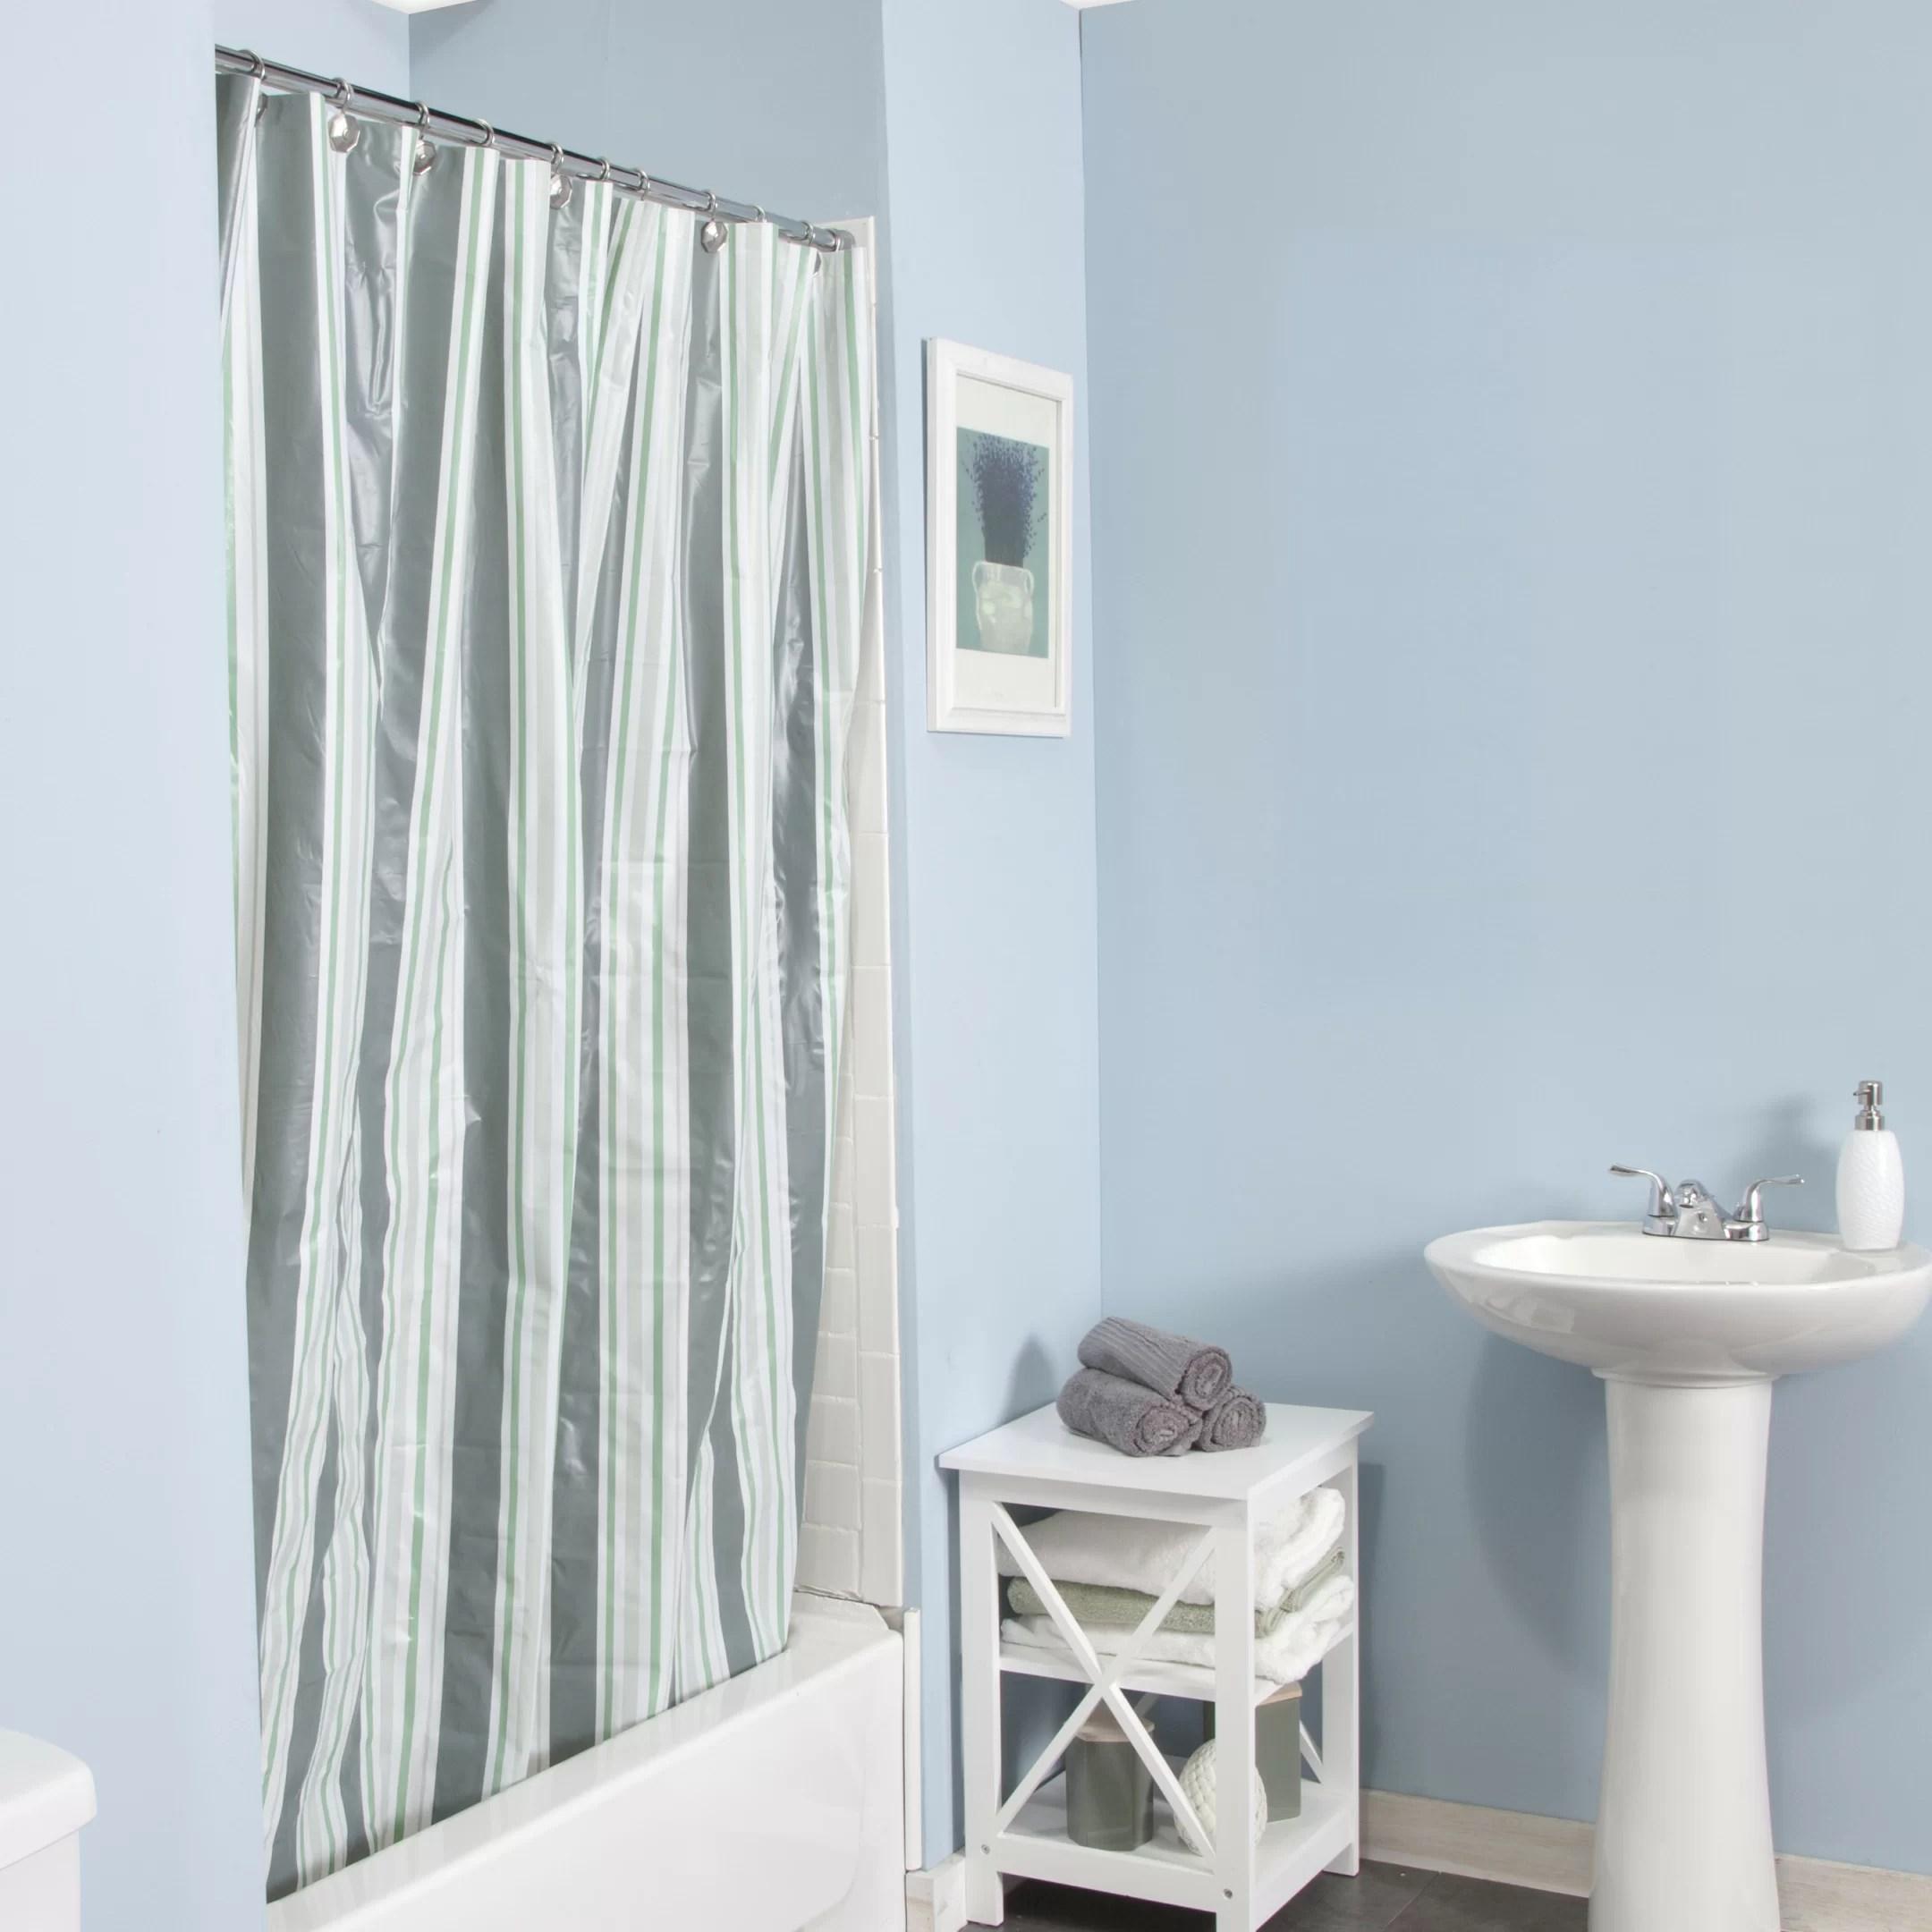 Vinyl Striped Shower Curtain Liner